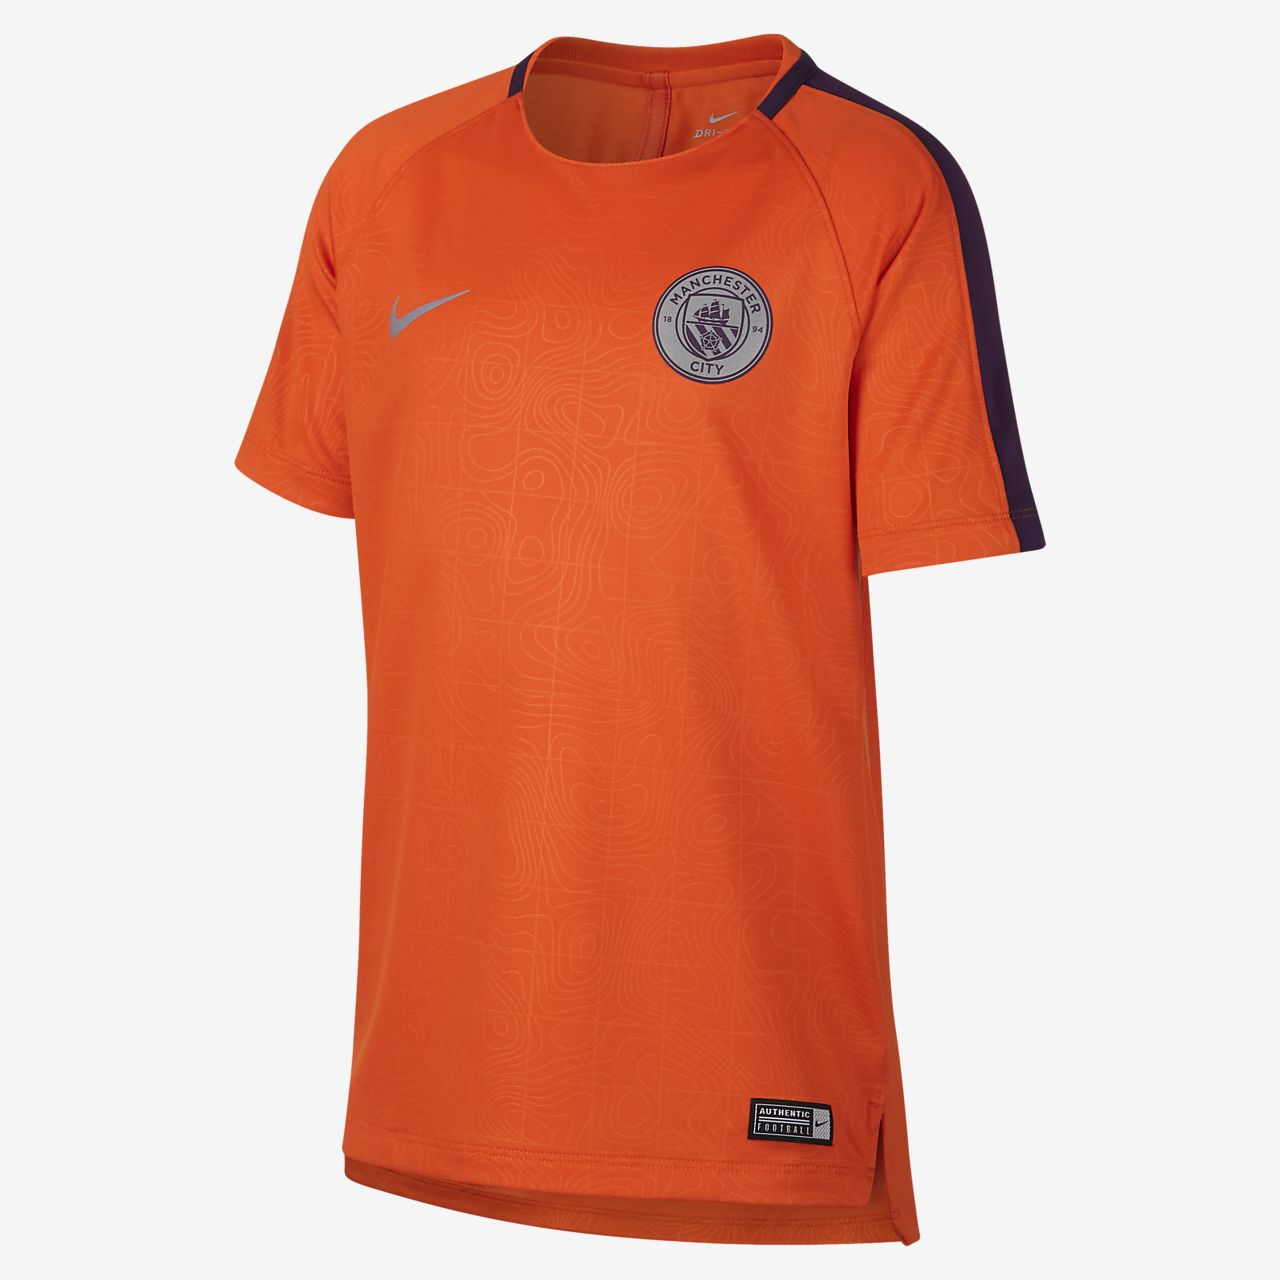 Manchester City Dri-FIT Squad Fußballoberteil für ältere Kinder